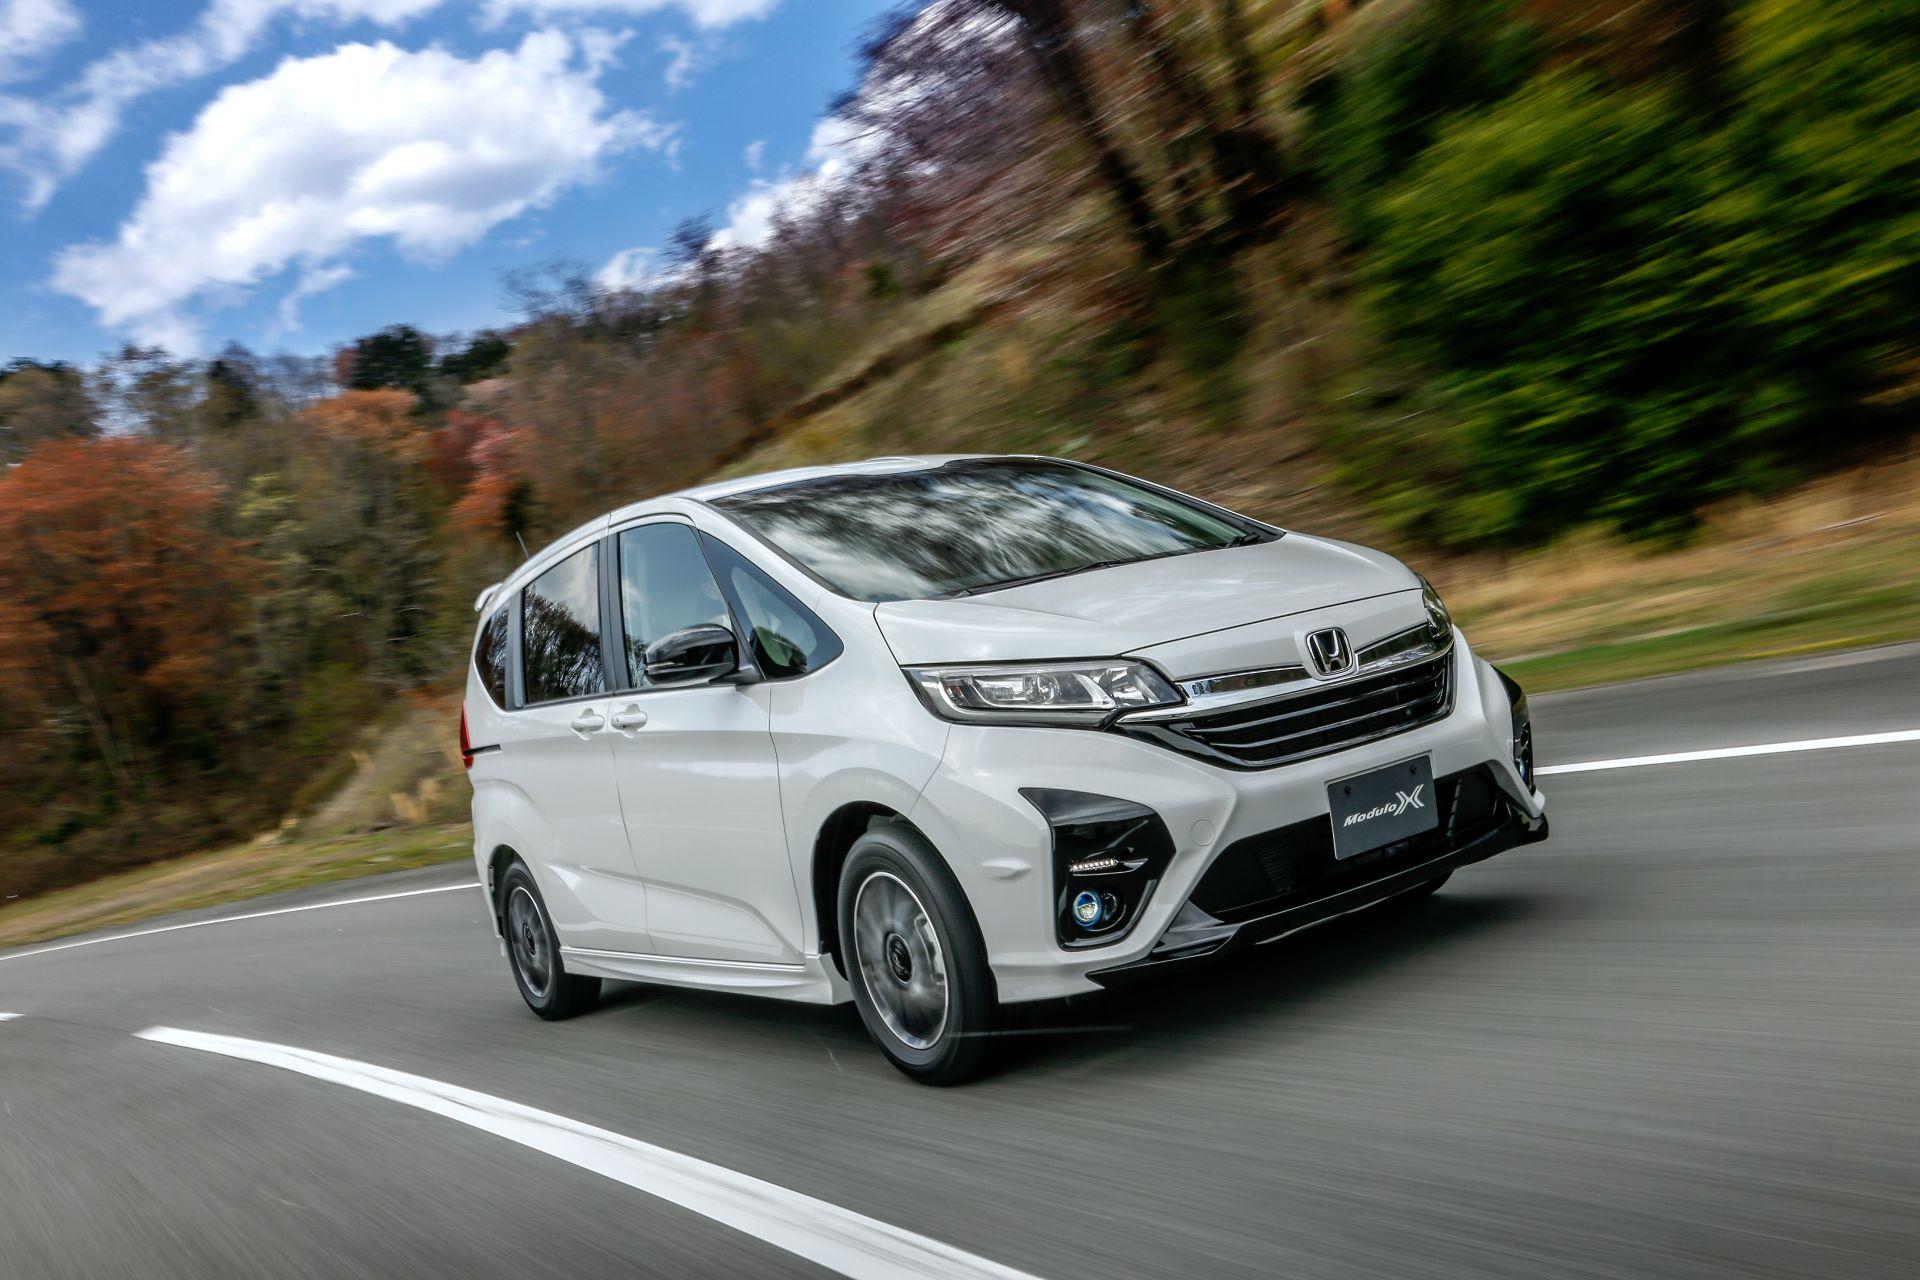 Honda-Freed-Modulo-X-Facelift-2020-28